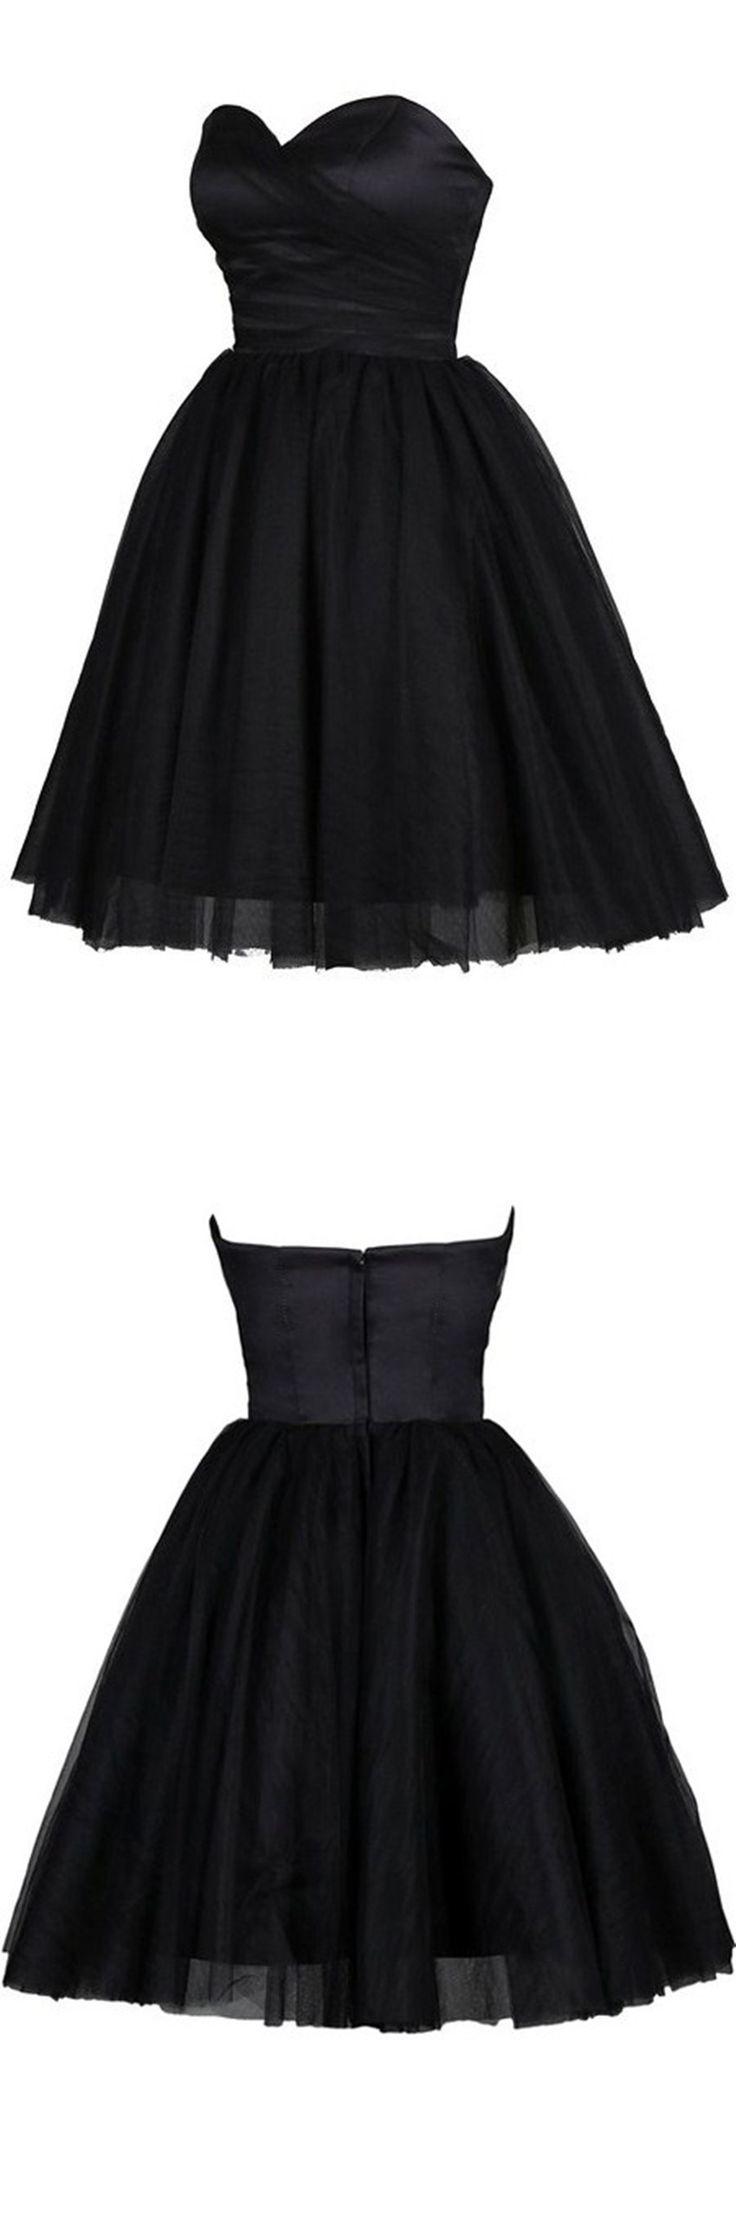 best dresses images on pinterest homecoming dress shorts